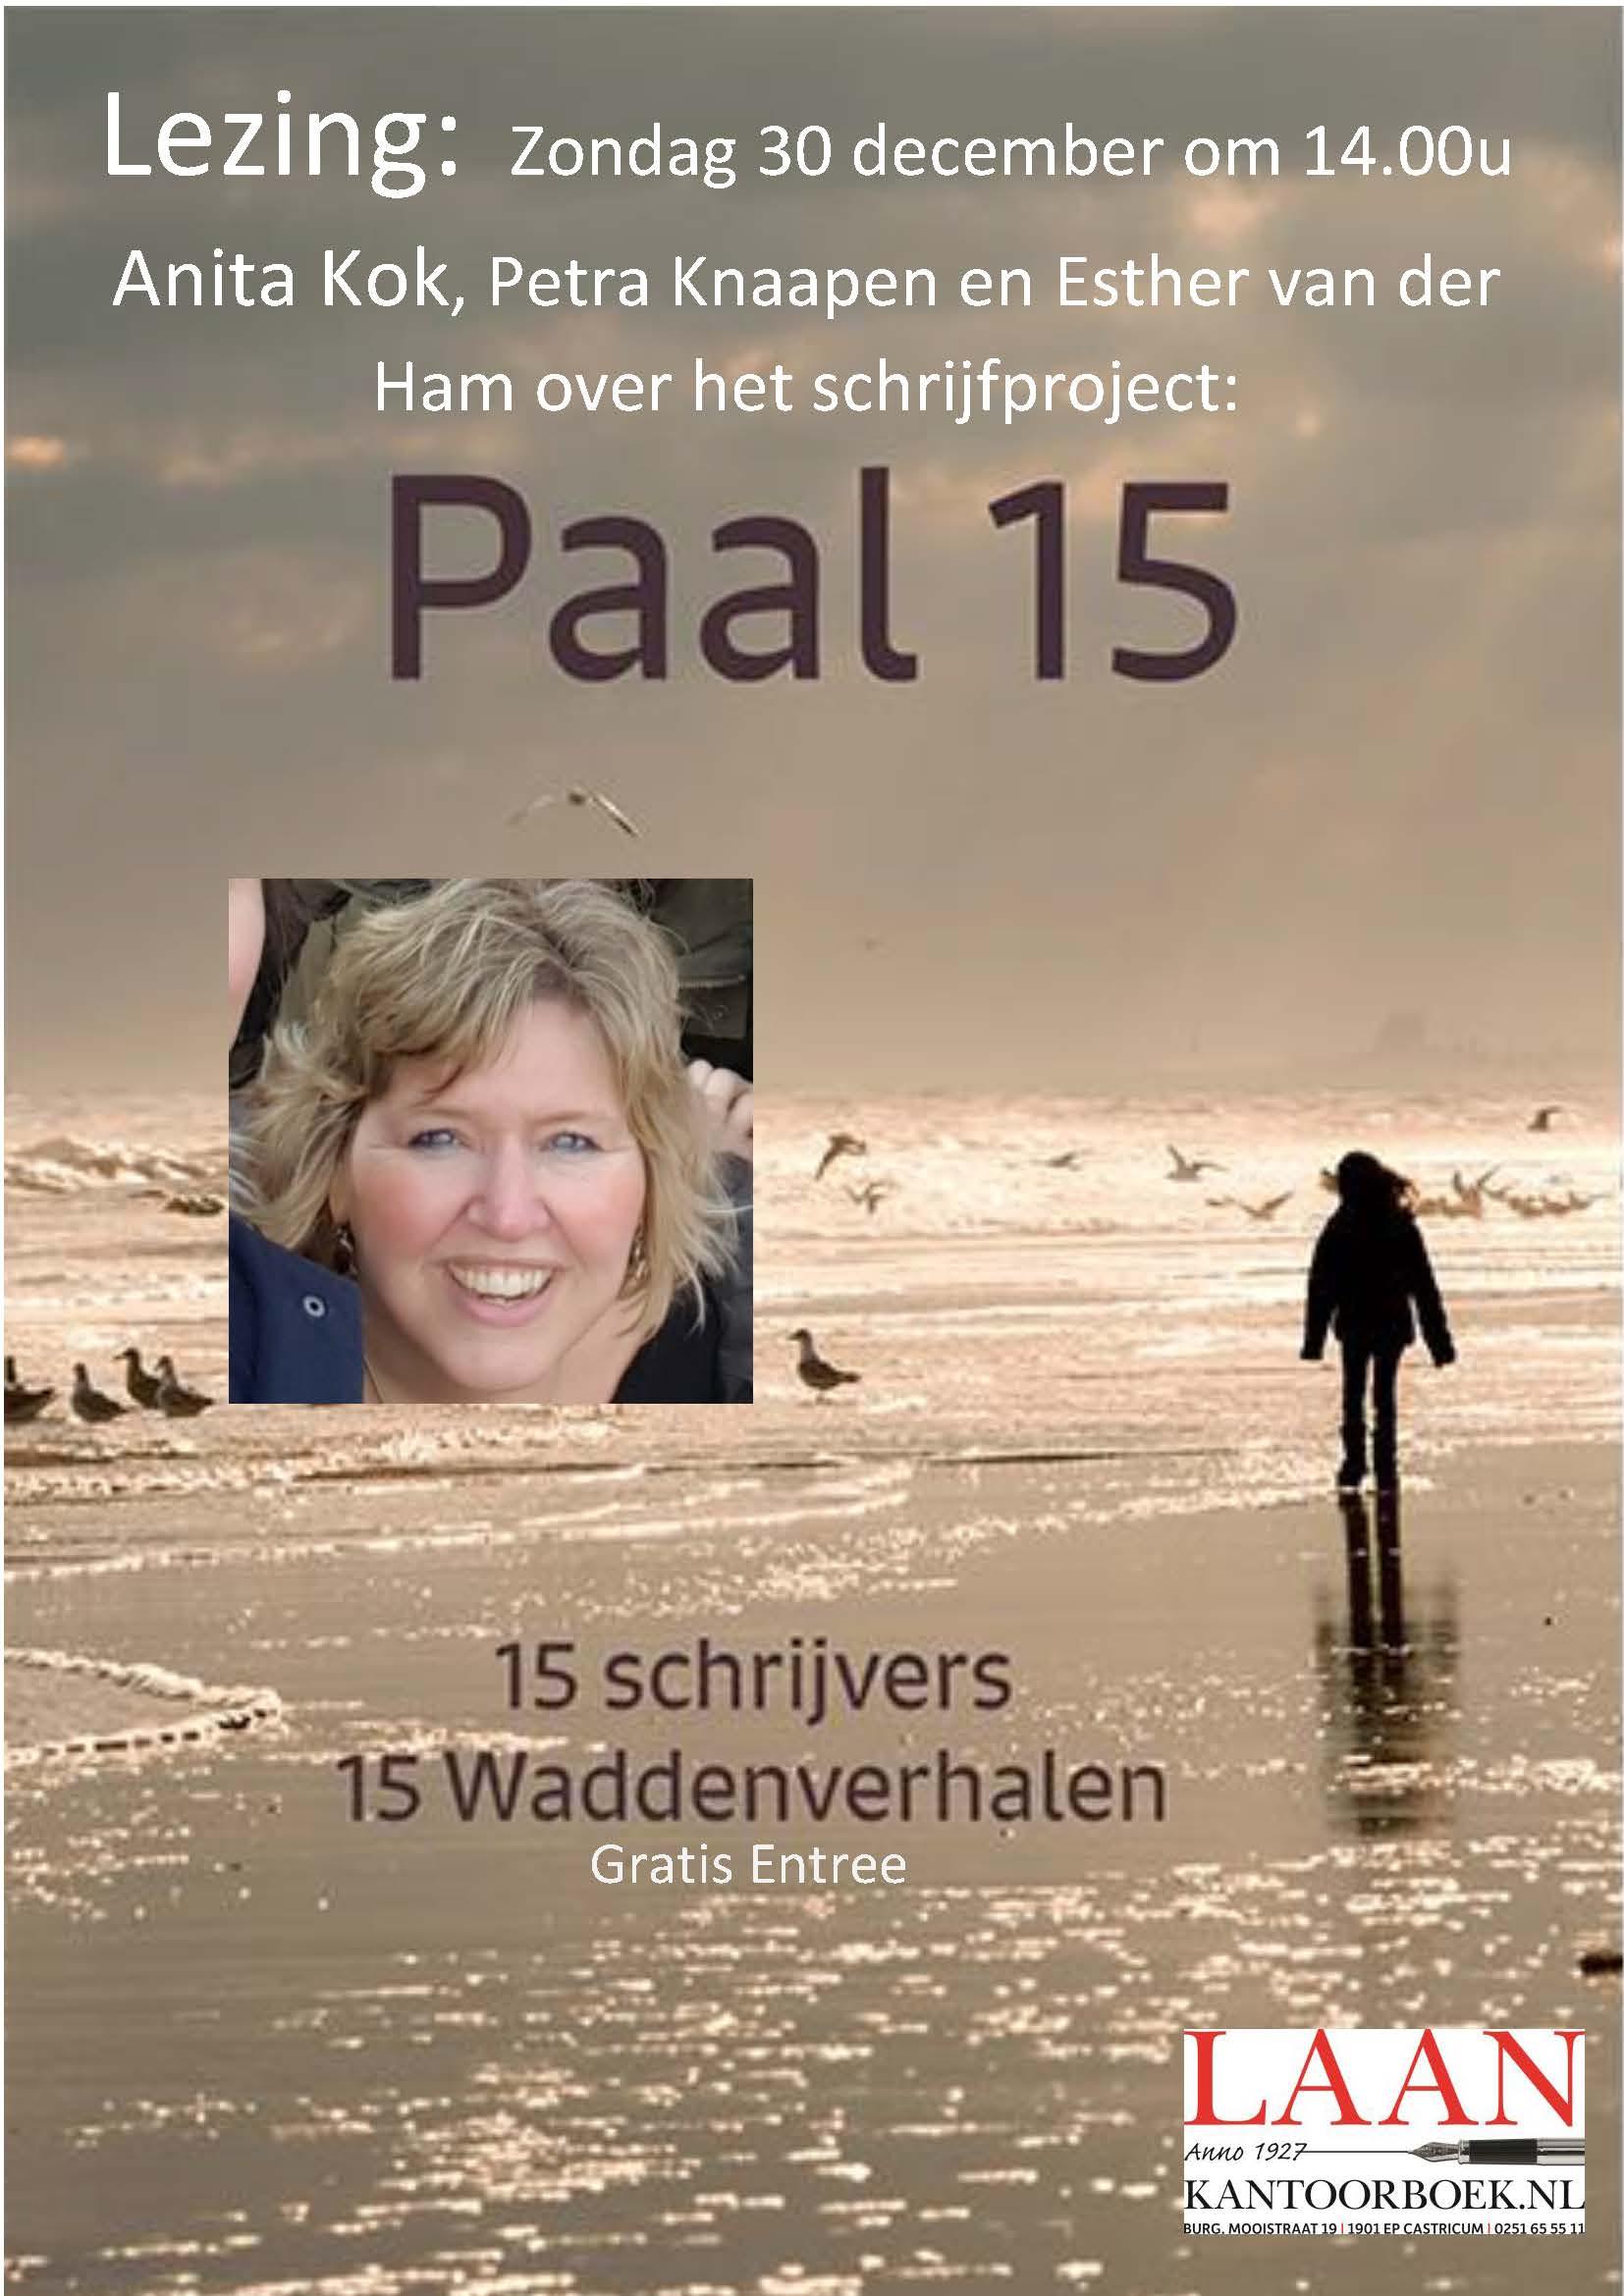 Lezing Waddenbundel Paal 15 30 december Castricum